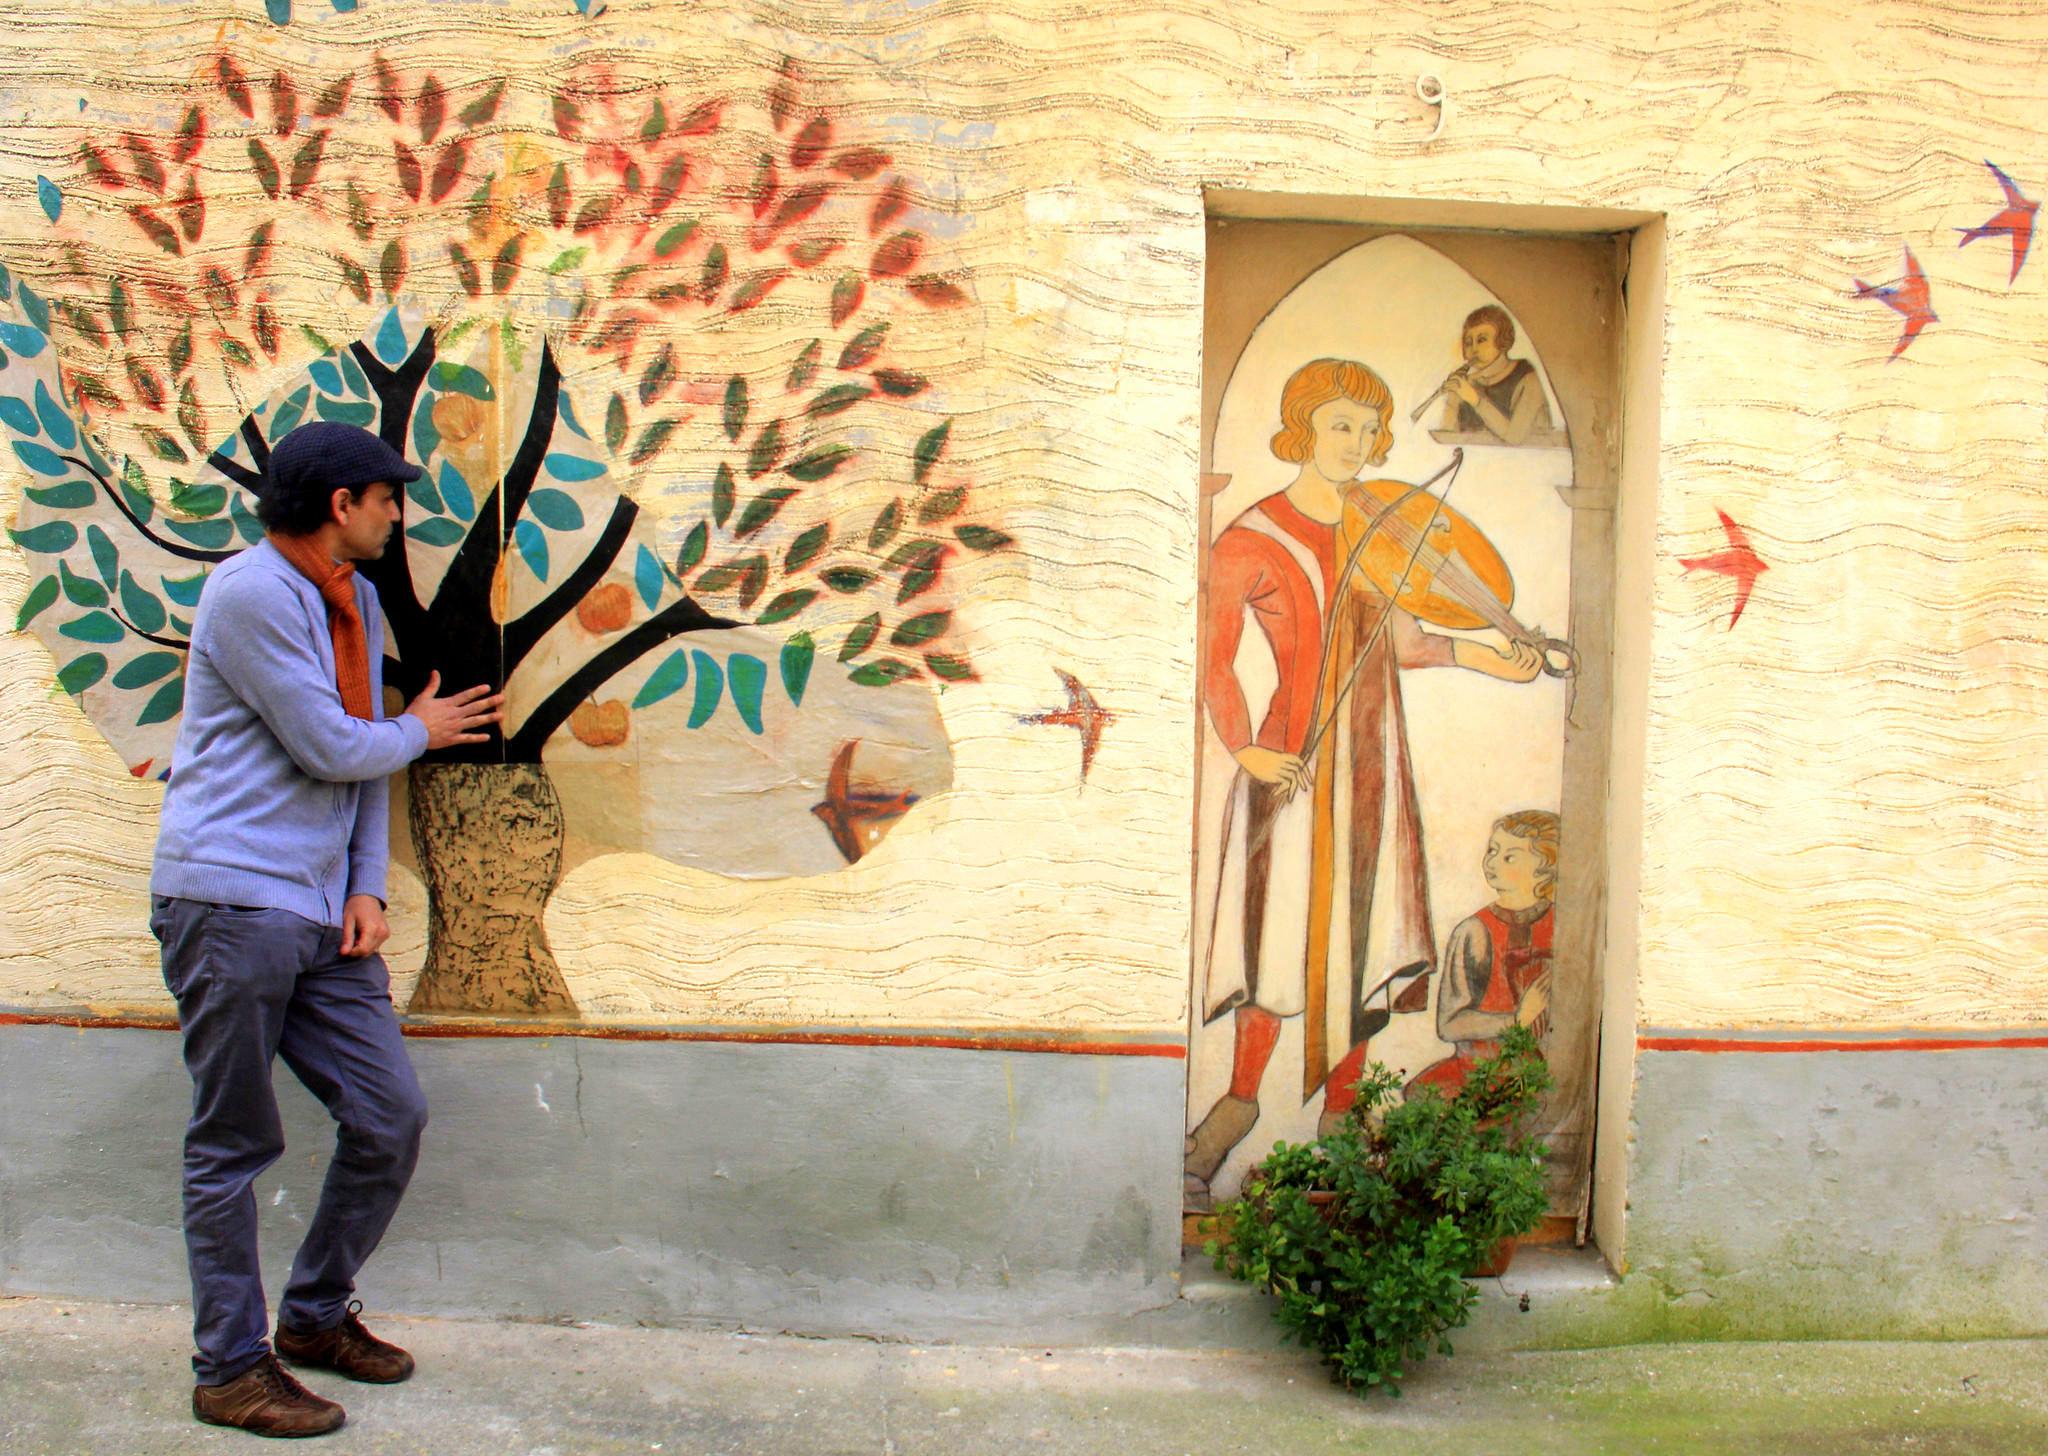 Street art in Carcassonne